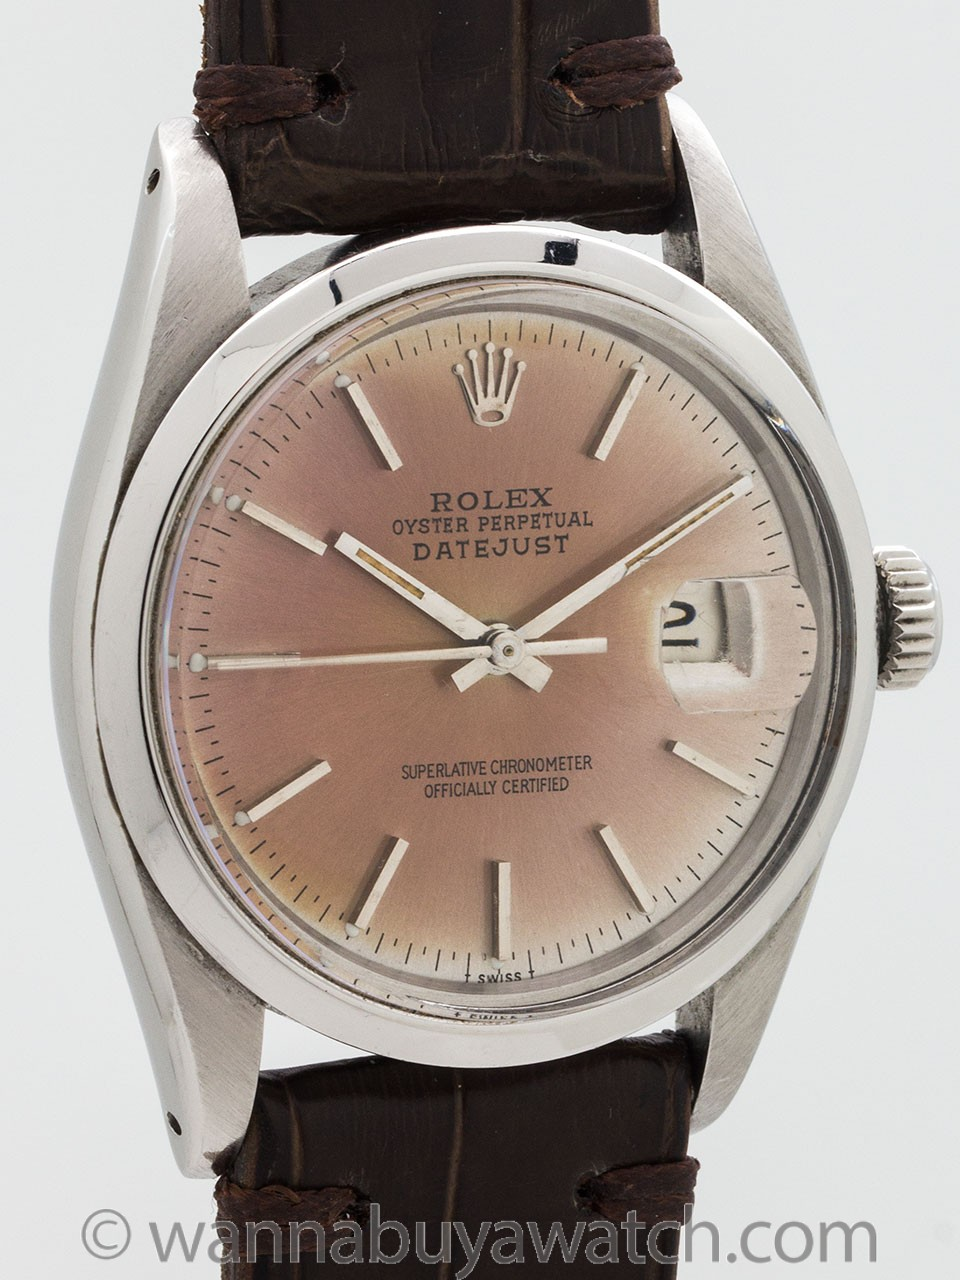 Rolex Datejust ref 16000 Patina'd Dial circa 1978